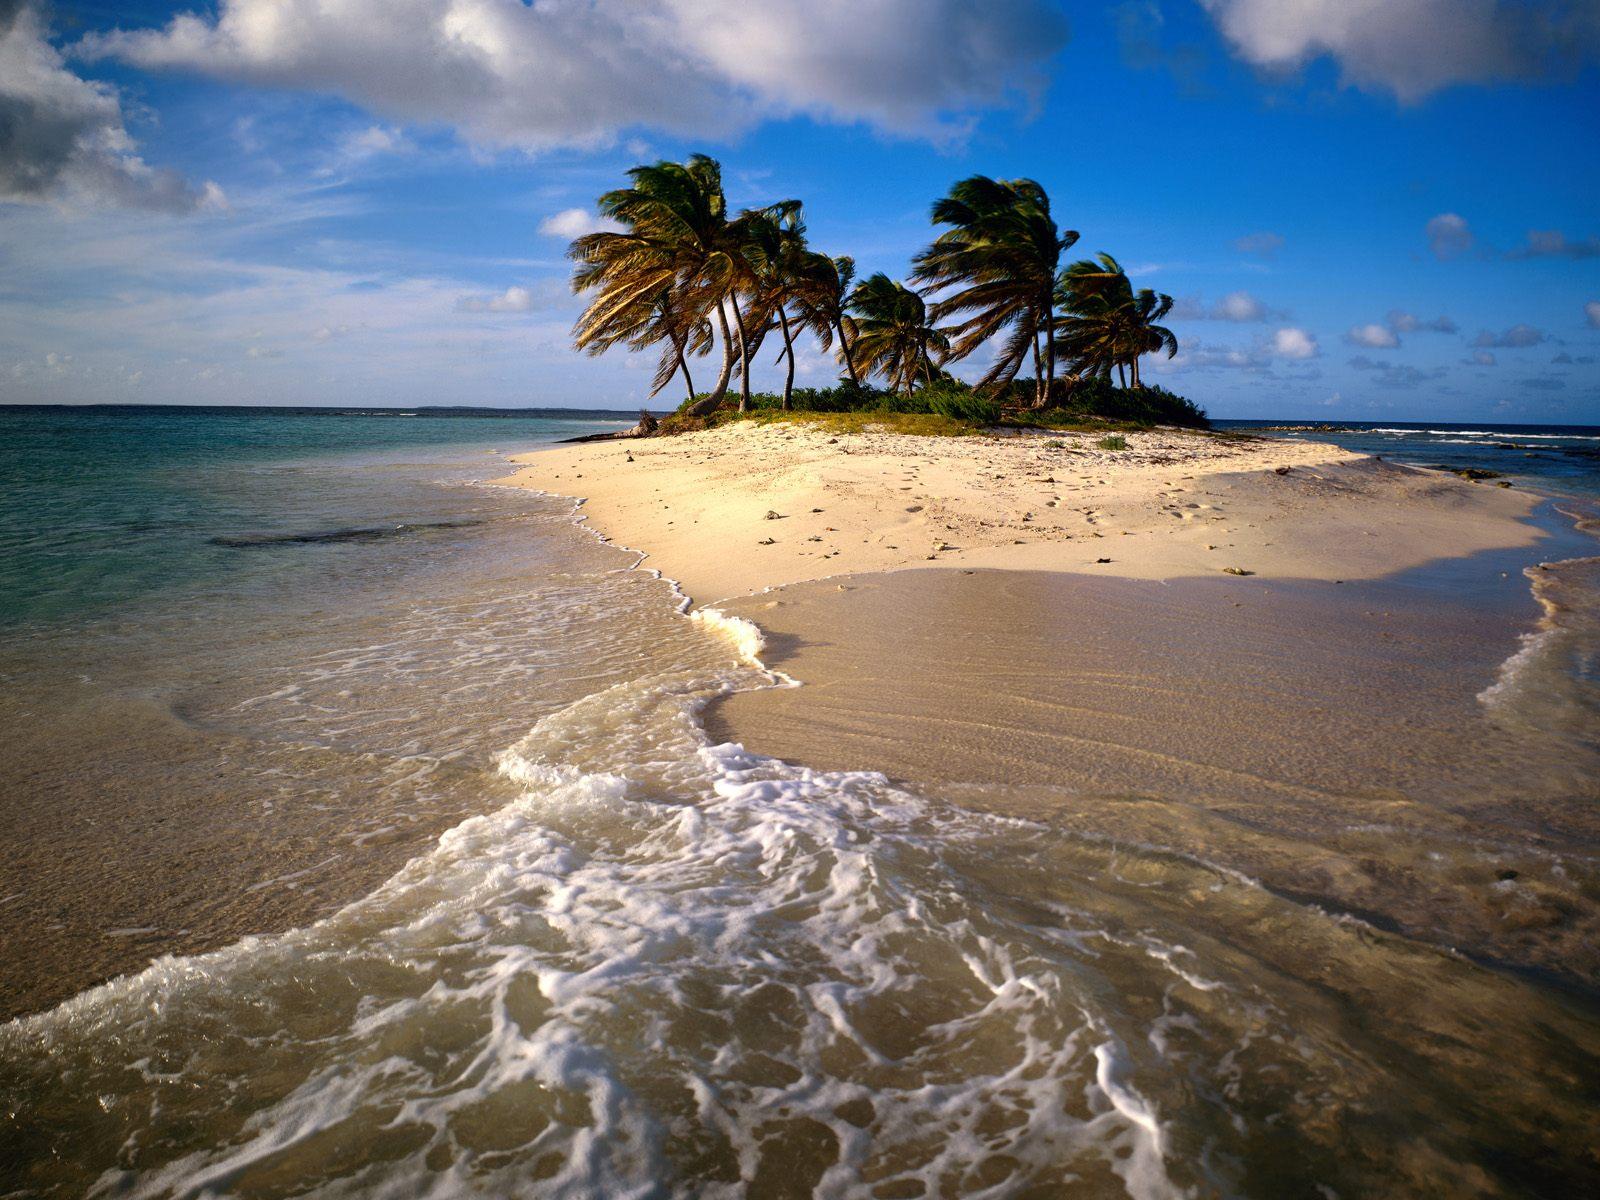 http://2.bp.blogspot.com/-0g0cs163_nA/T3cfyj15HYI/AAAAAAAAA8k/HWKNWIbm-Ms/s1600/Sandy+Island+Caribbean.jpg